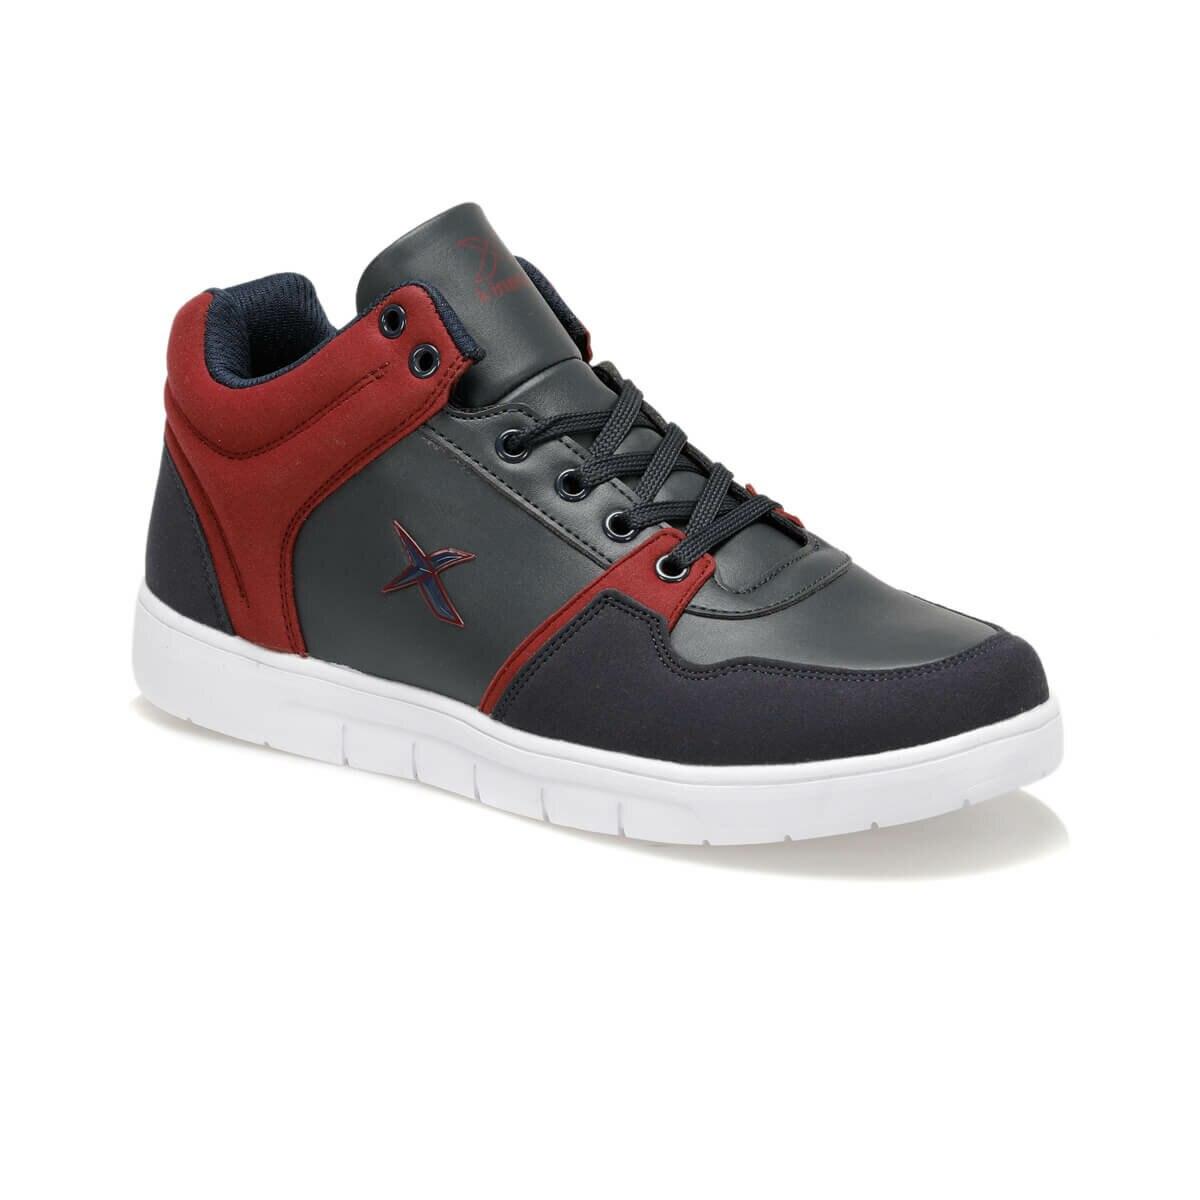 FLO ASGAR HI 9PR Navy Blue Men 'S Sneaker Shoes KINETIX